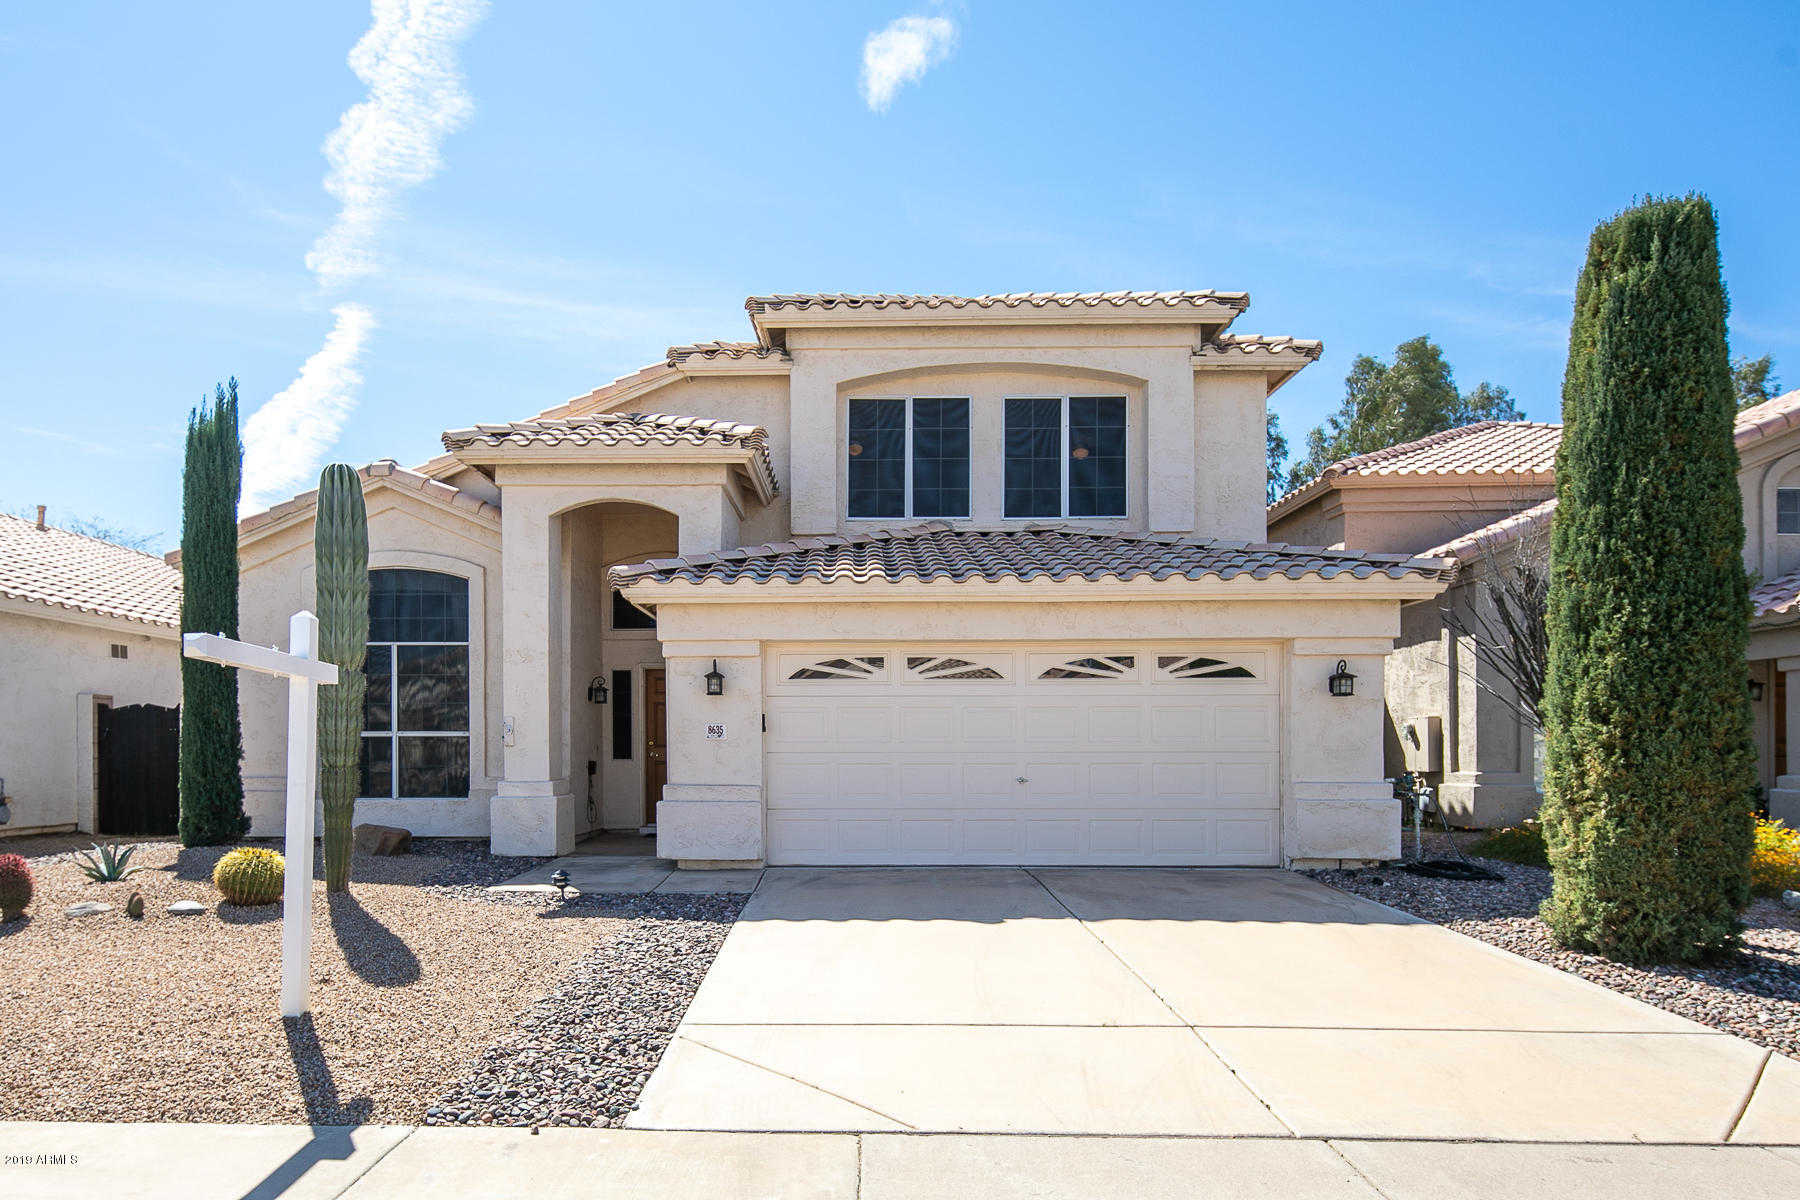 $400,000 - 4Br/3Ba - Home for Sale in Pima Crossing, Scottsdale